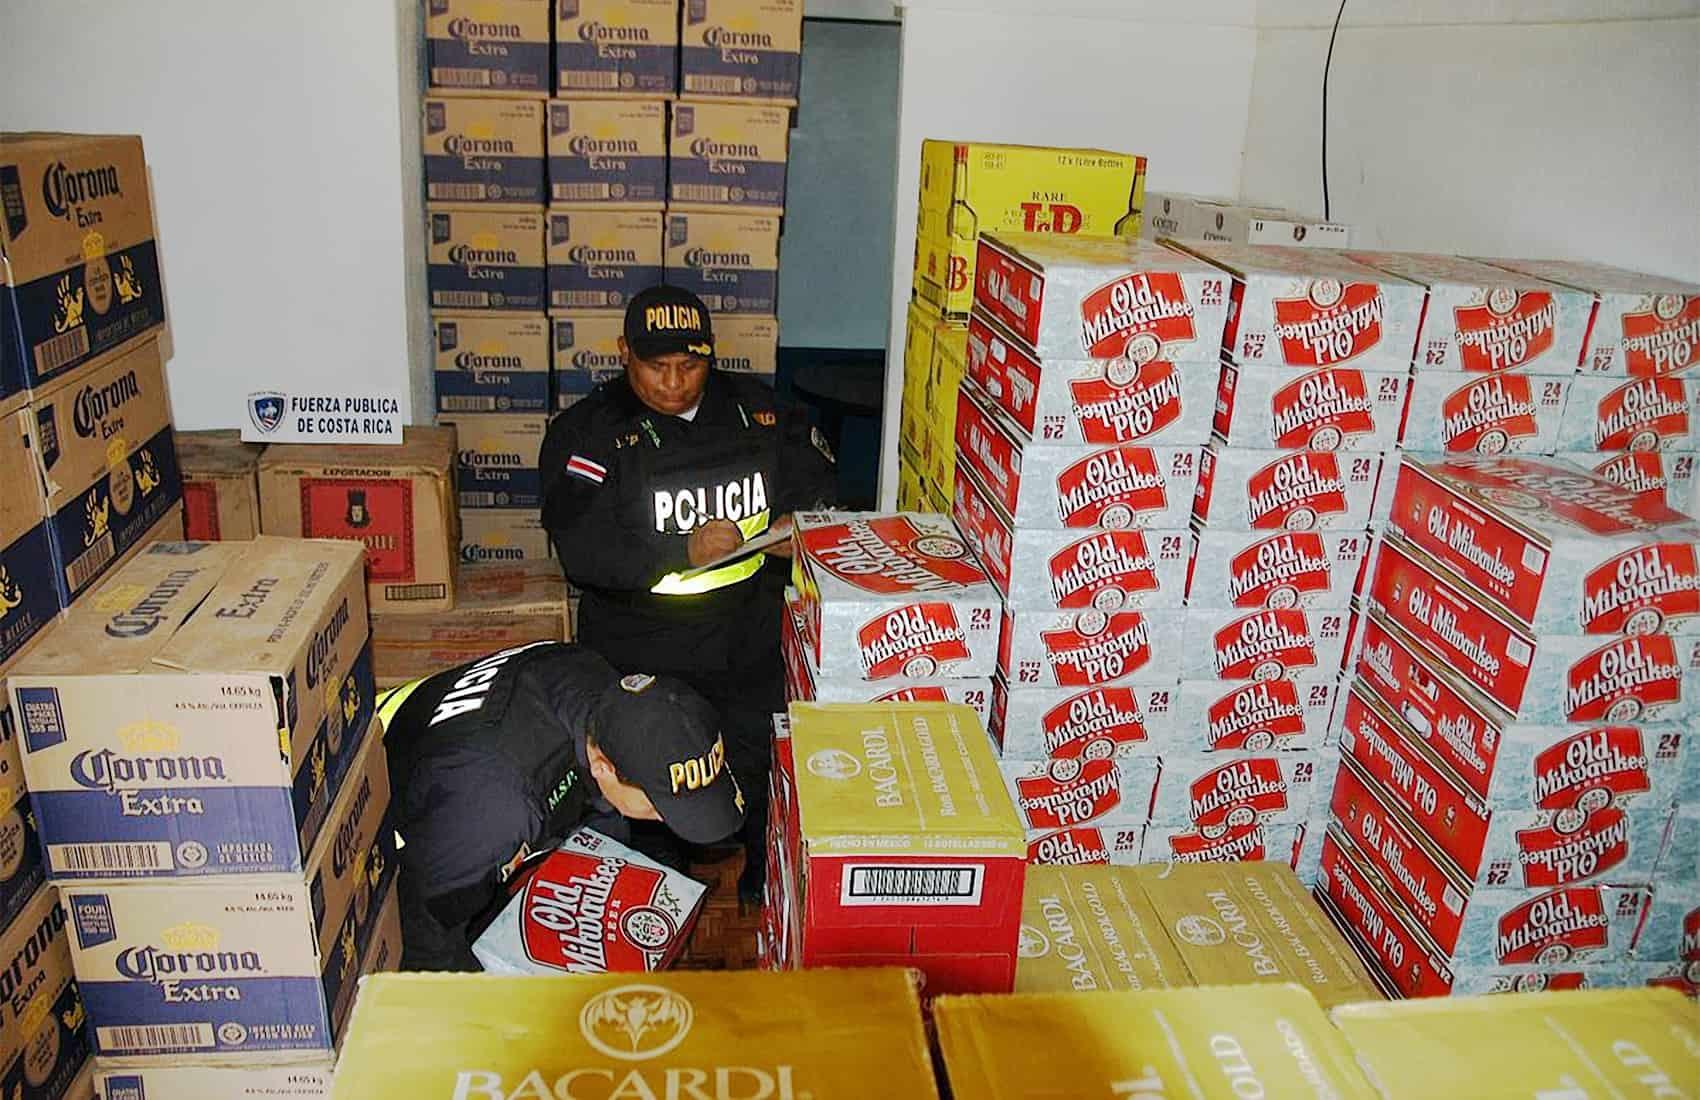 Contraband liquour